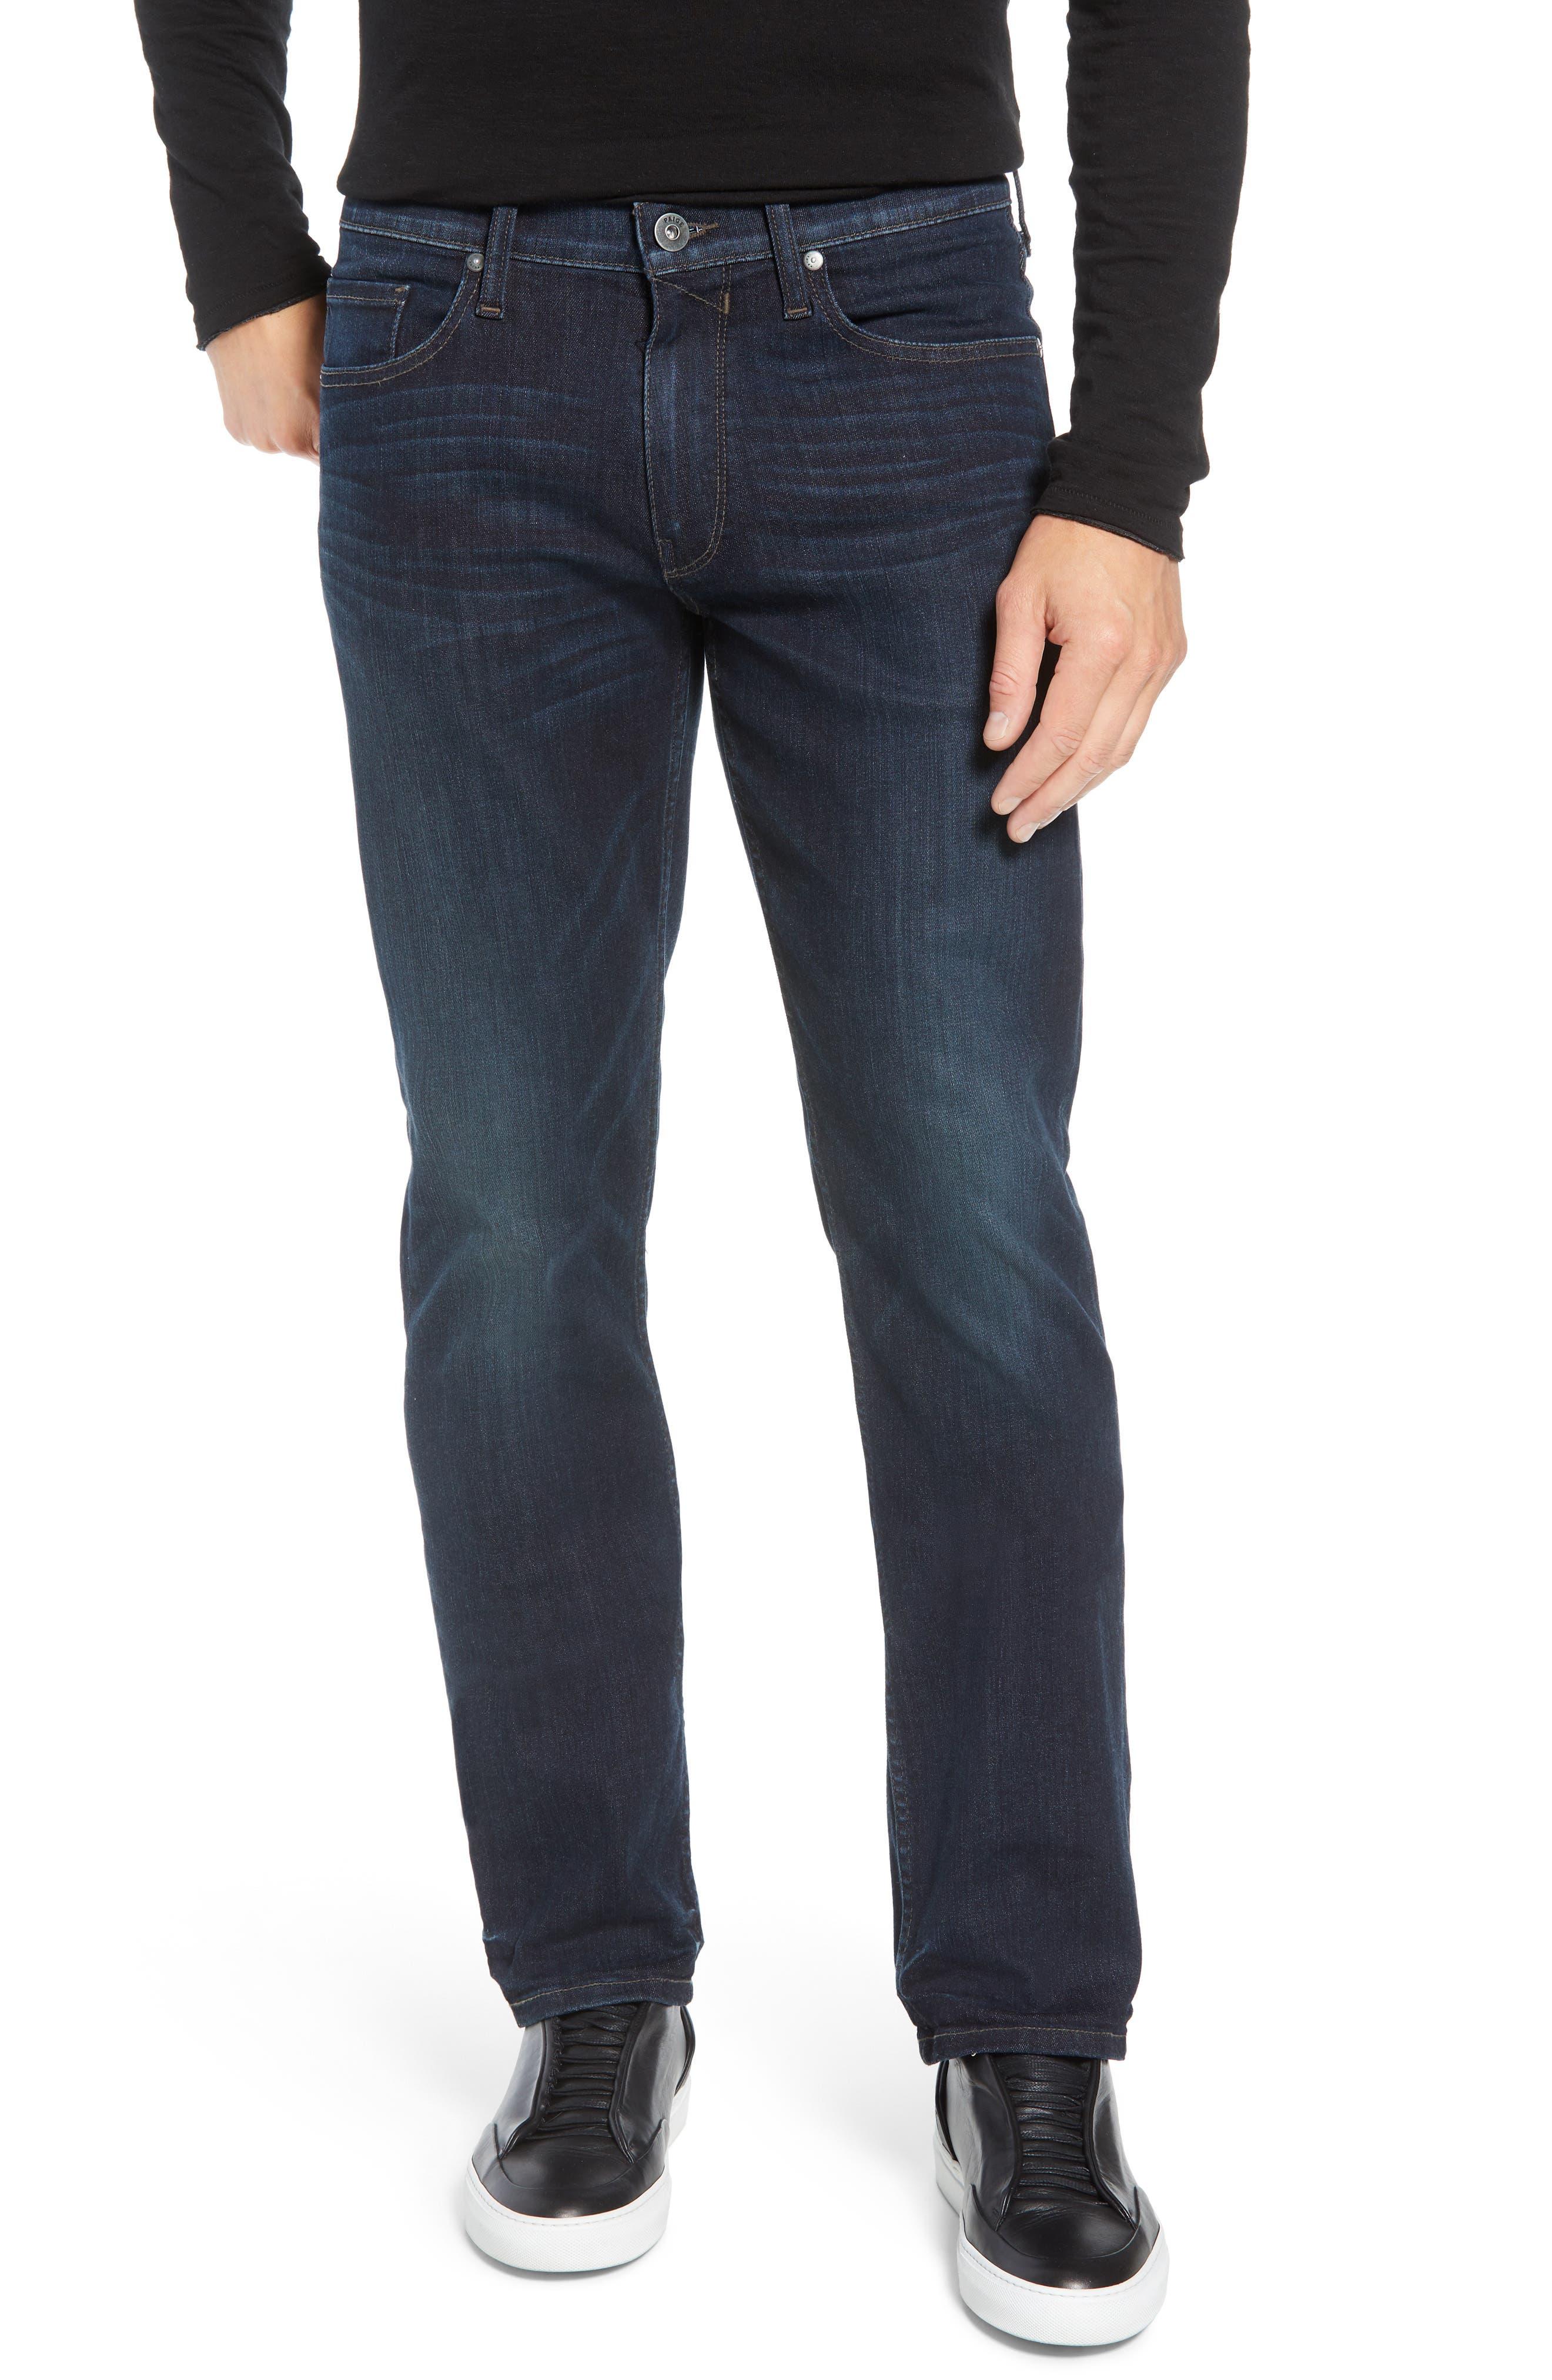 Transcend - Normandie Straight Leg Jeans,                             Main thumbnail 1, color,                             KENAN